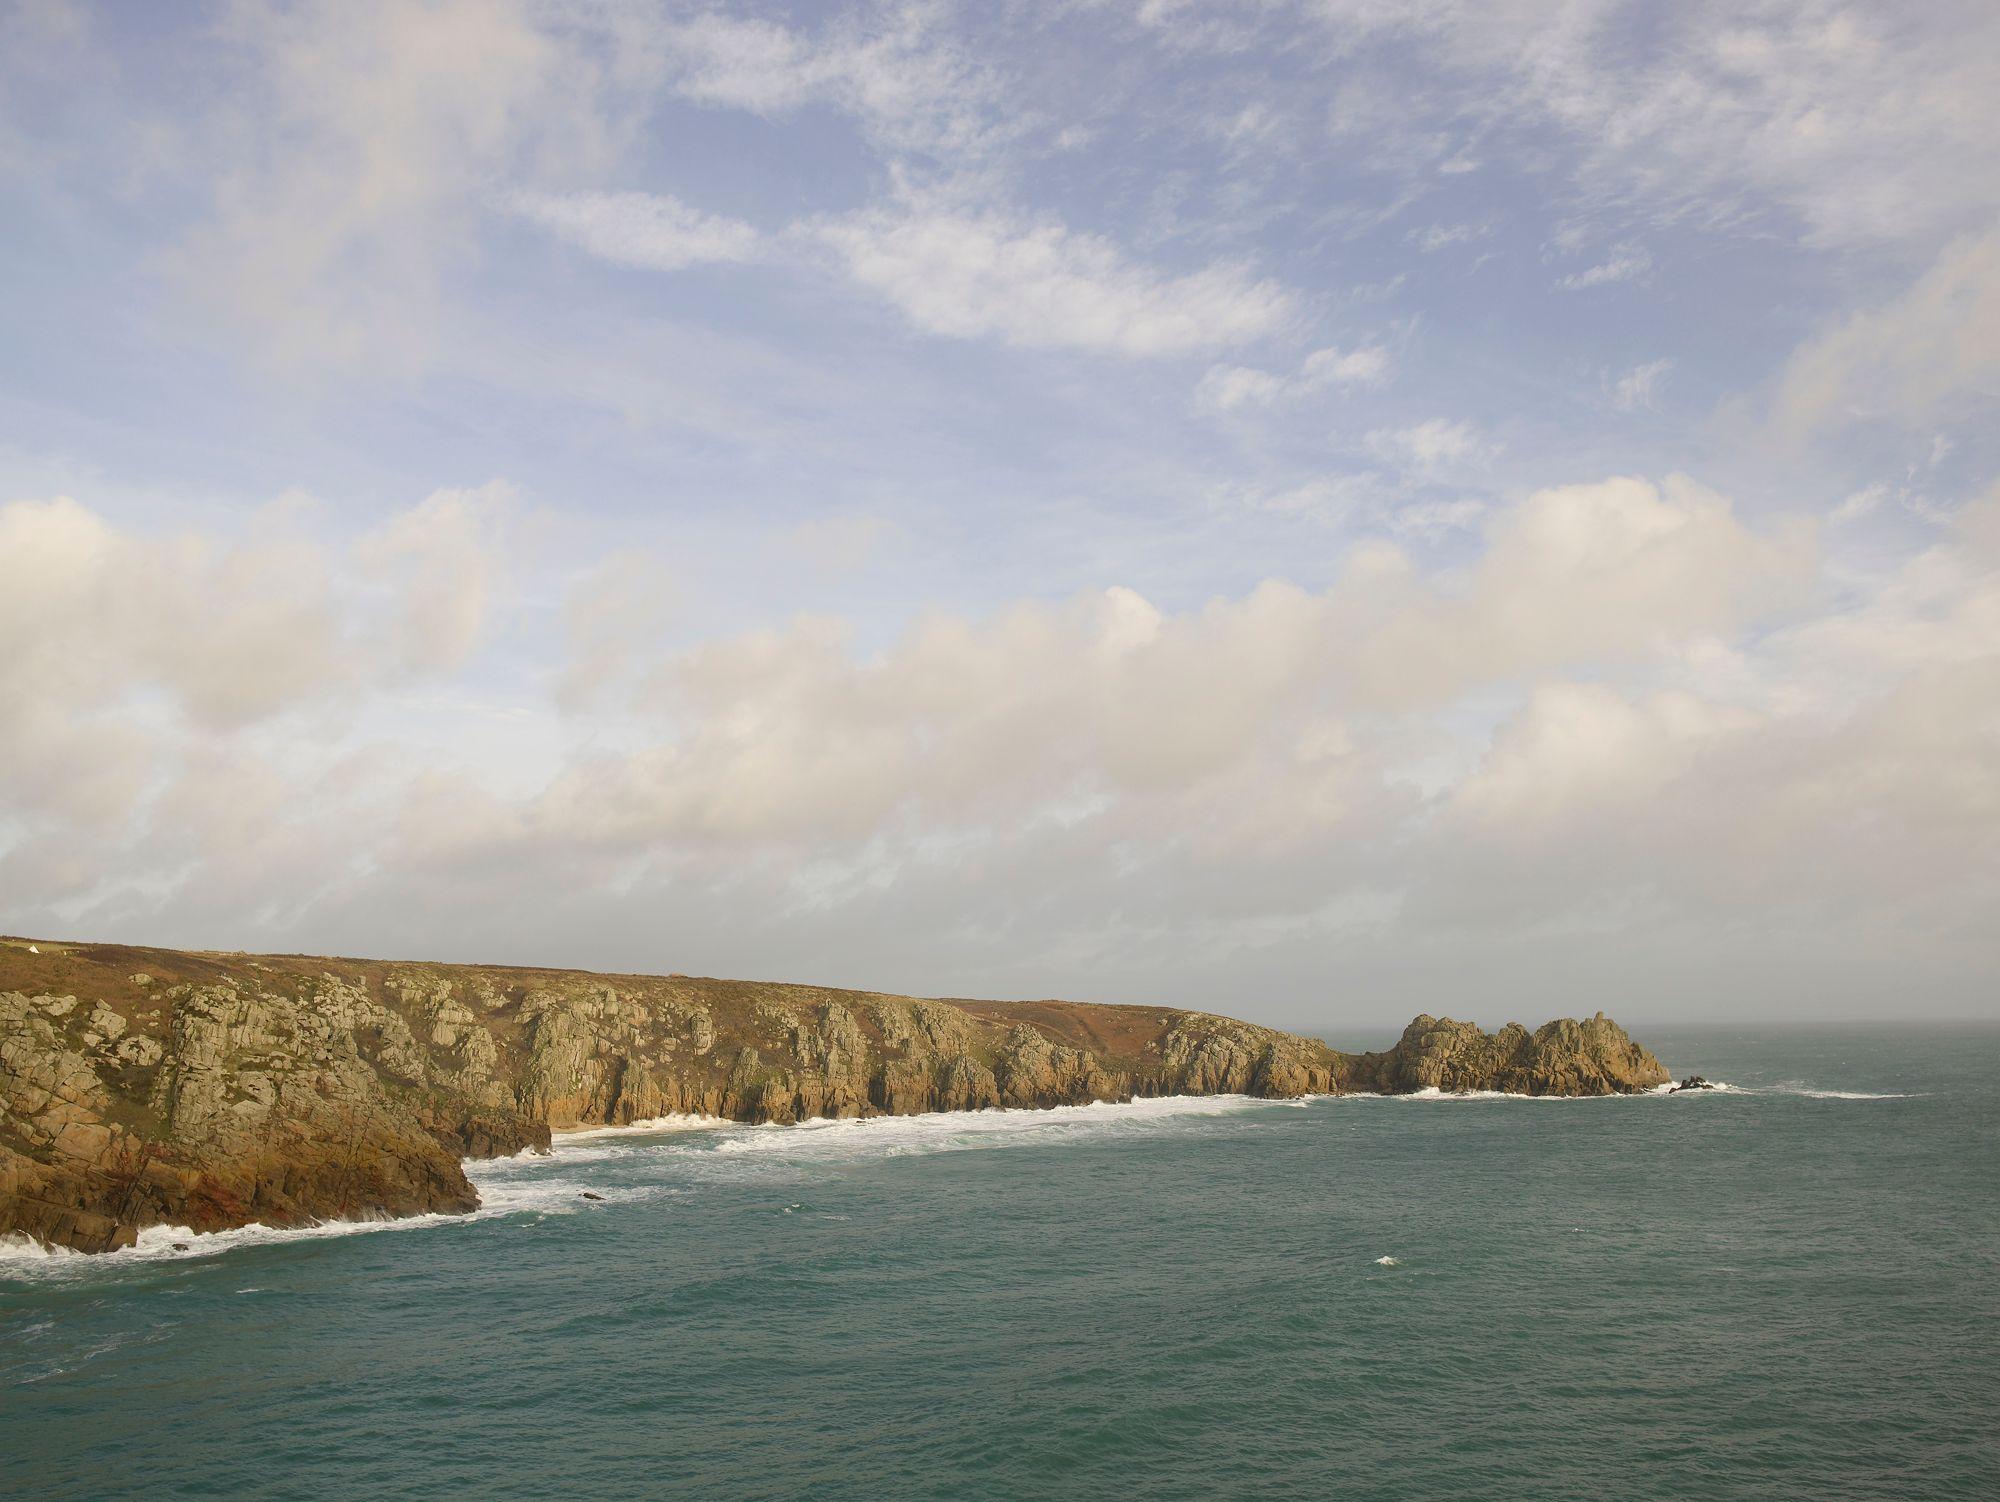 Logan Rock and Cliffs